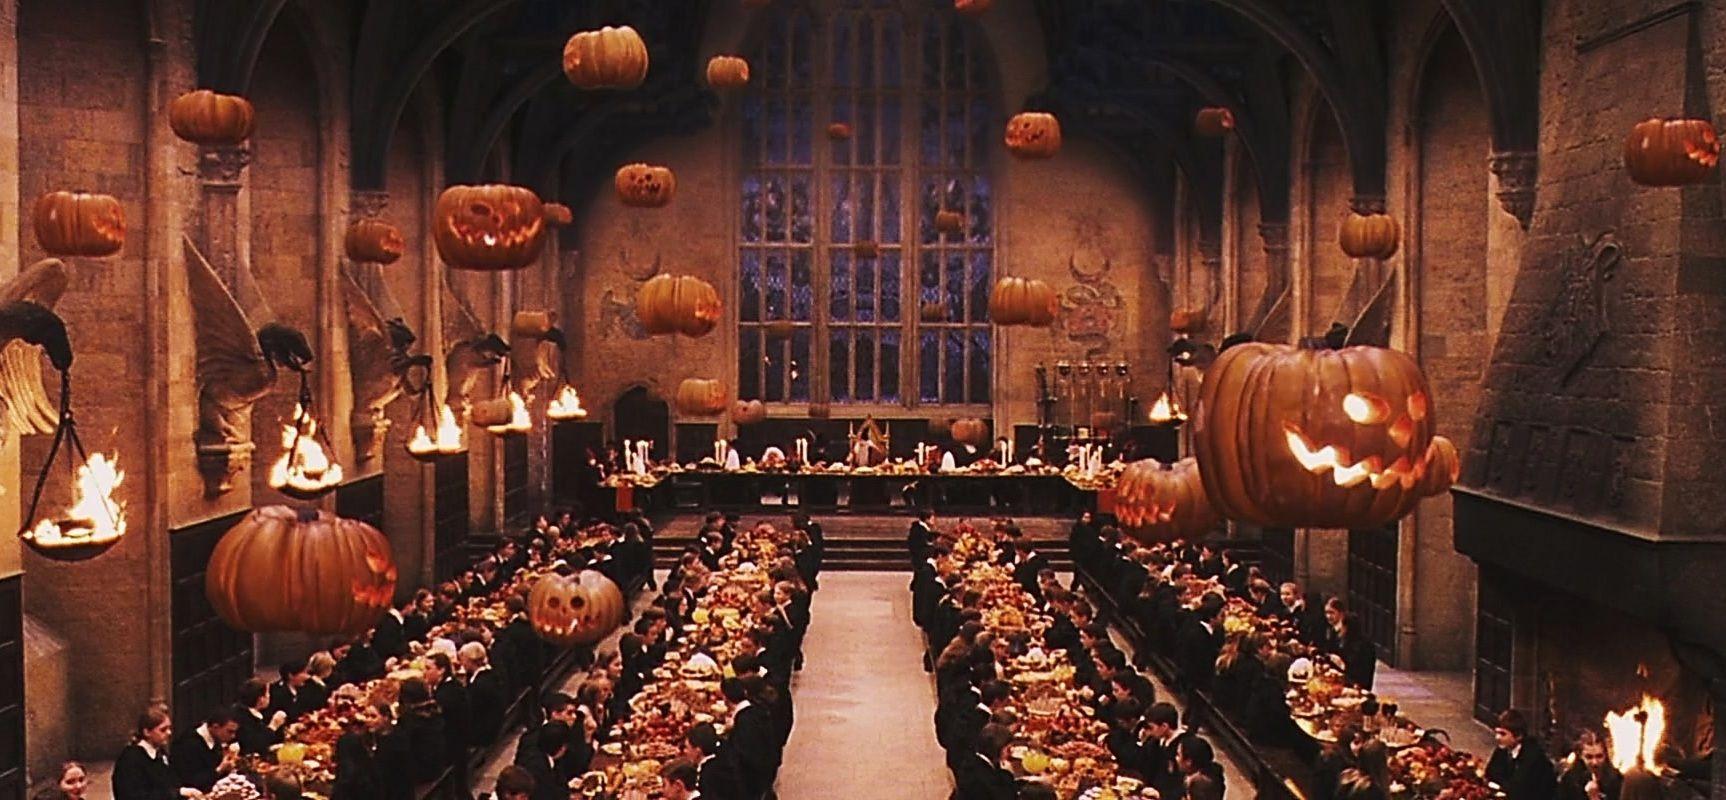 Top Wallpaper Harry Potter Dining Hall - 70629589b11af755e7a0e14175211984  HD_69333.jpg